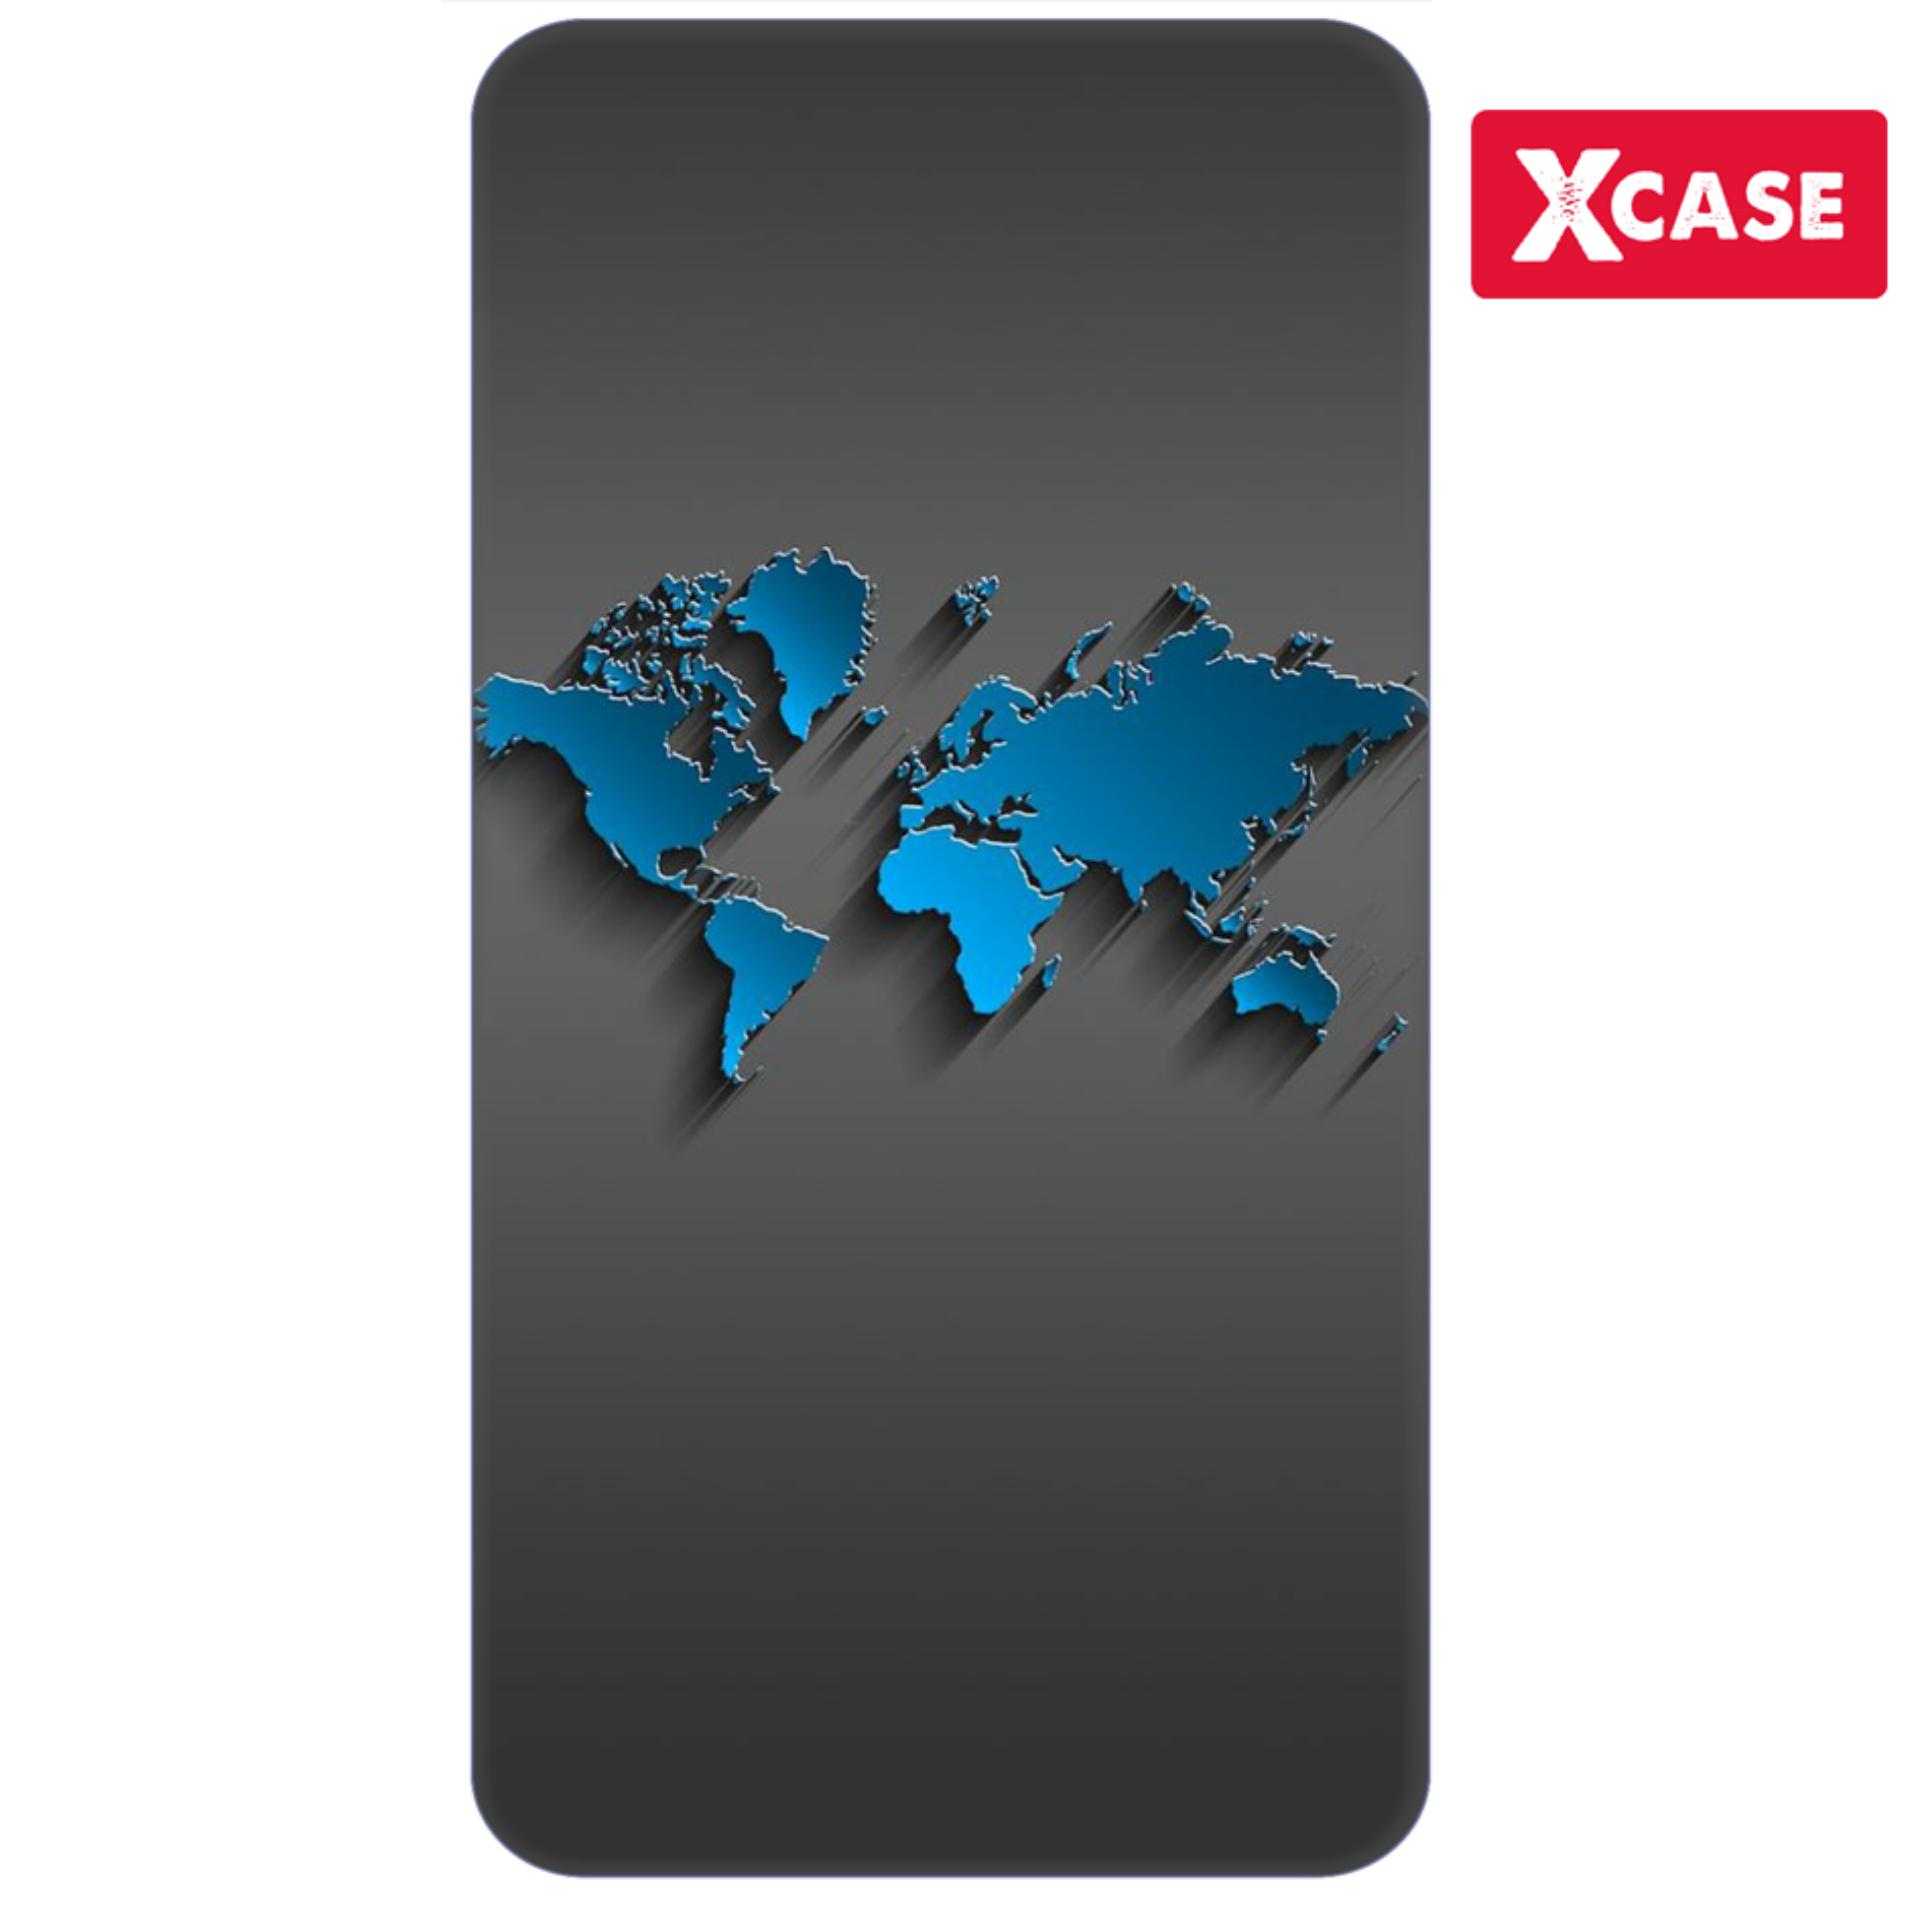 Hình ảnh Ốp lưng HTC Desire 10 Pro nhựa dẻo Silicon - Xcase D66